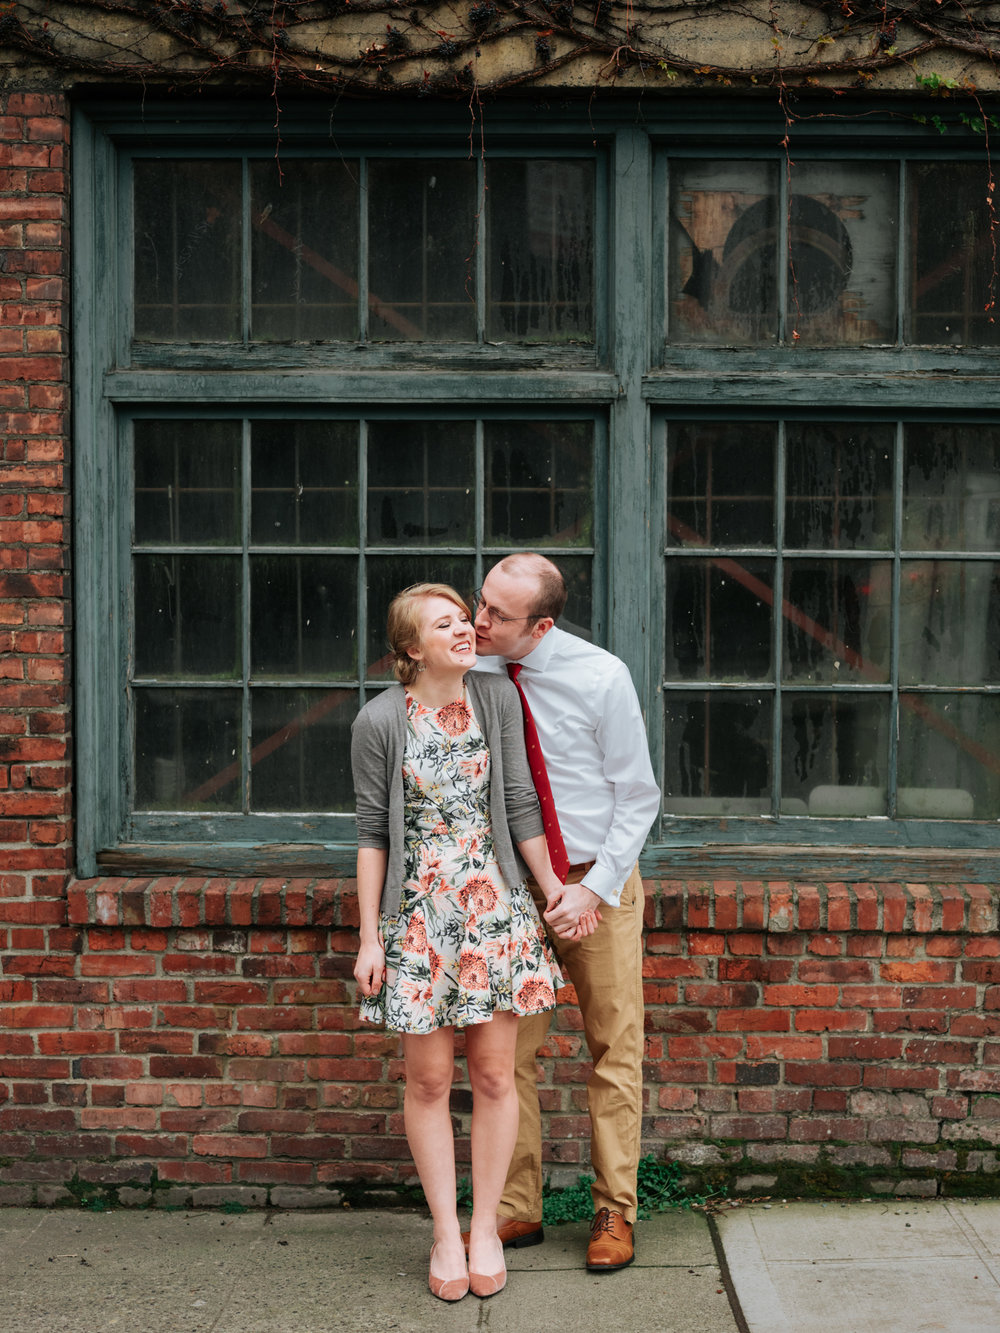 Stolen Glimpses Seattle Wedding Photographer 5.jpg